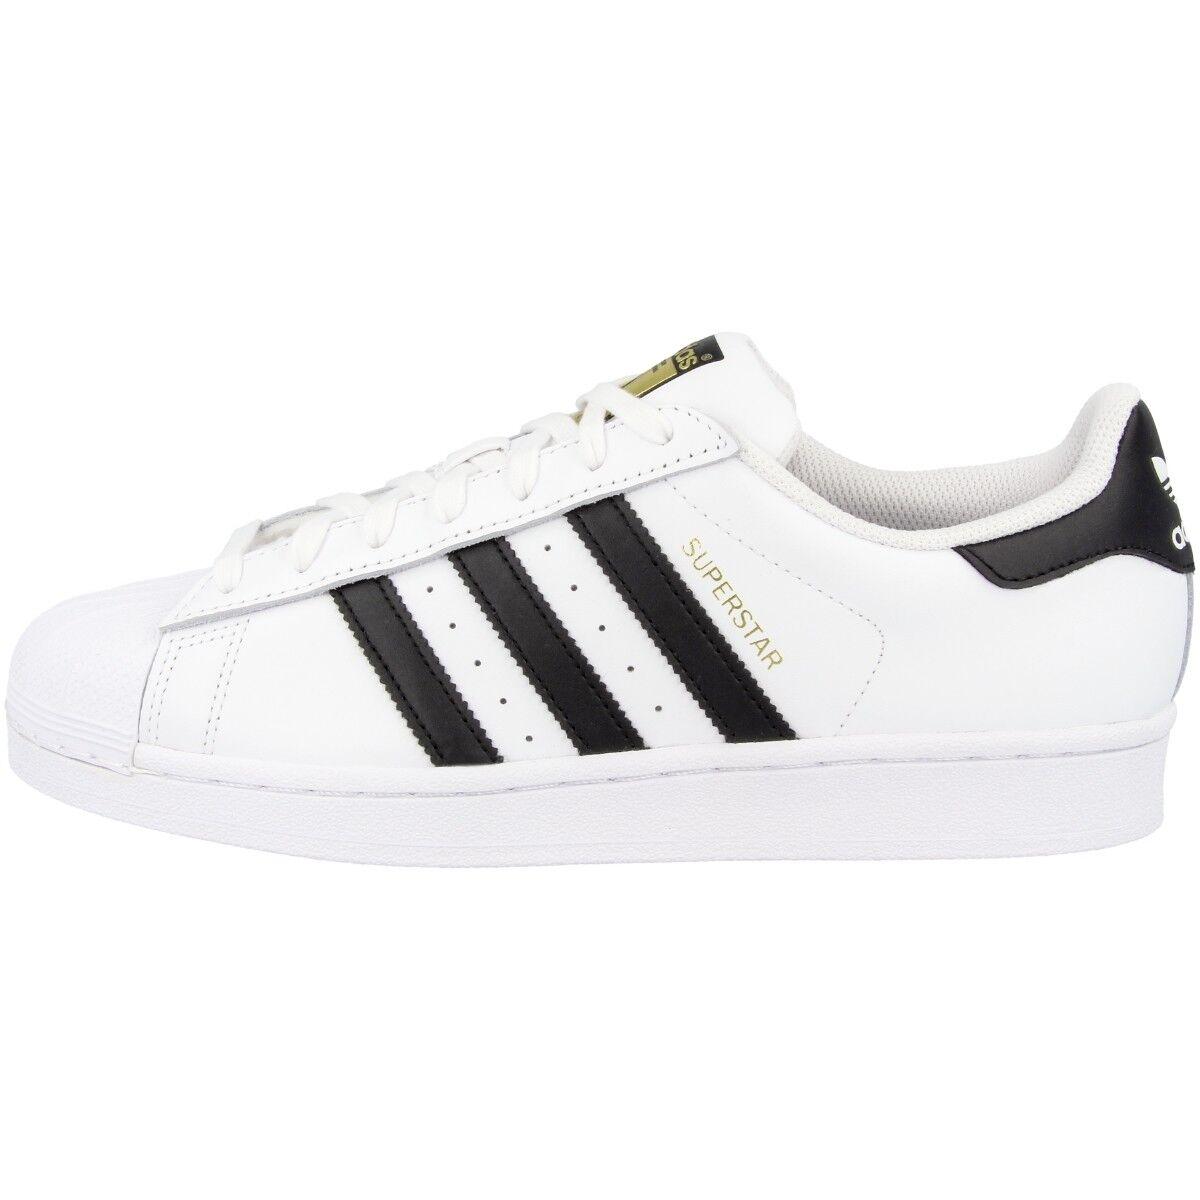 ADIDAS SUPERSTAR Zapatos RETRO KLASSIKER SNEAKER SPEZIAL Blanco Negro C77124 SAMBA SPEZIAL SNEAKER de9782